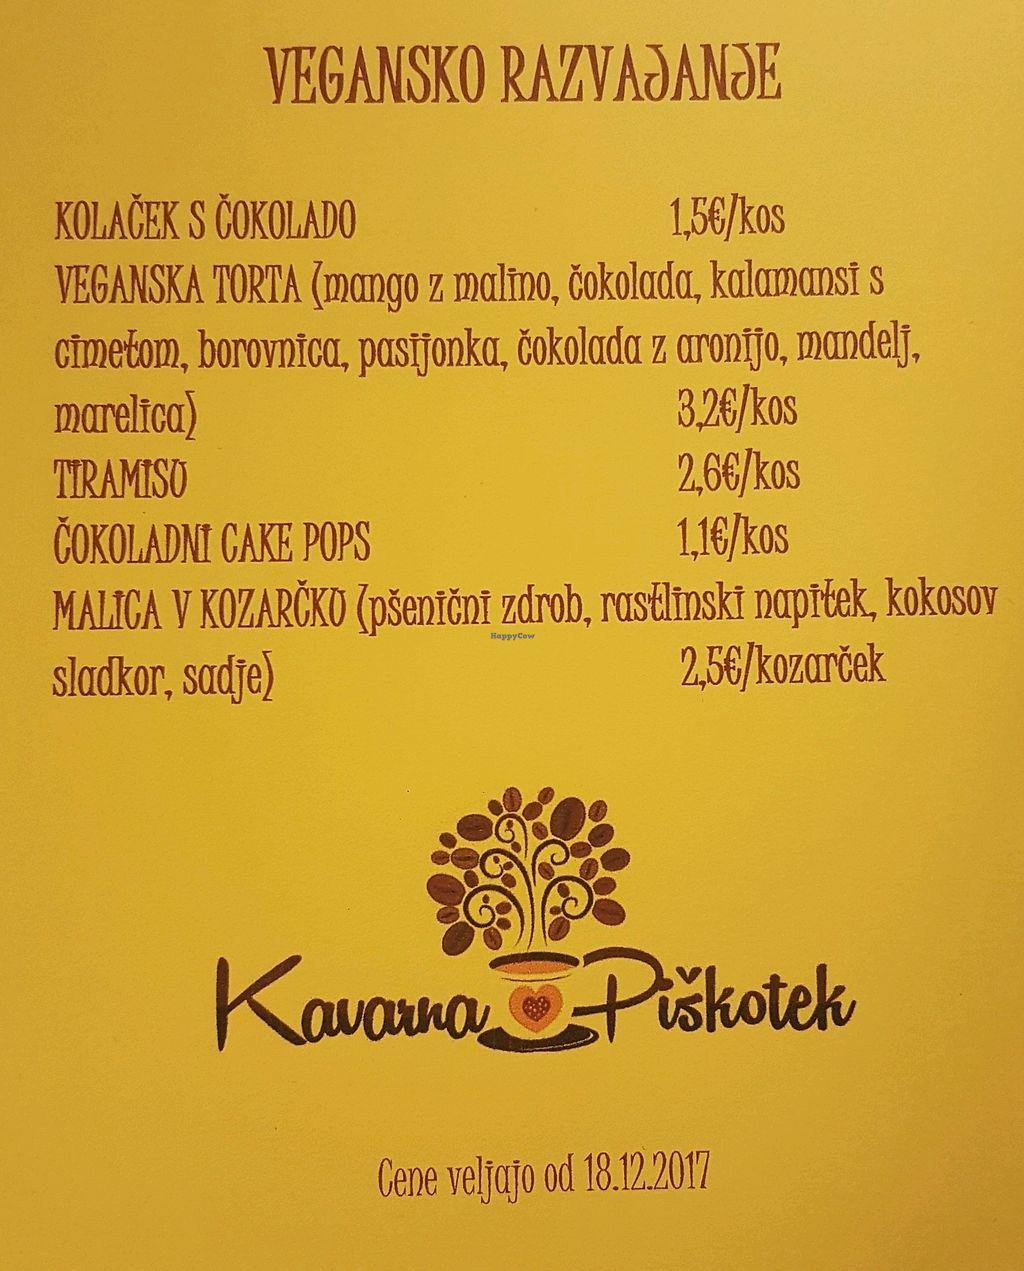 "Photo of Kavarna Piškotek  by <a href=""/members/profile/NenaKo"">NenaKo</a> <br/>menu <br/> March 7, 2018  - <a href='/contact/abuse/image/112792/367823'>Report</a>"